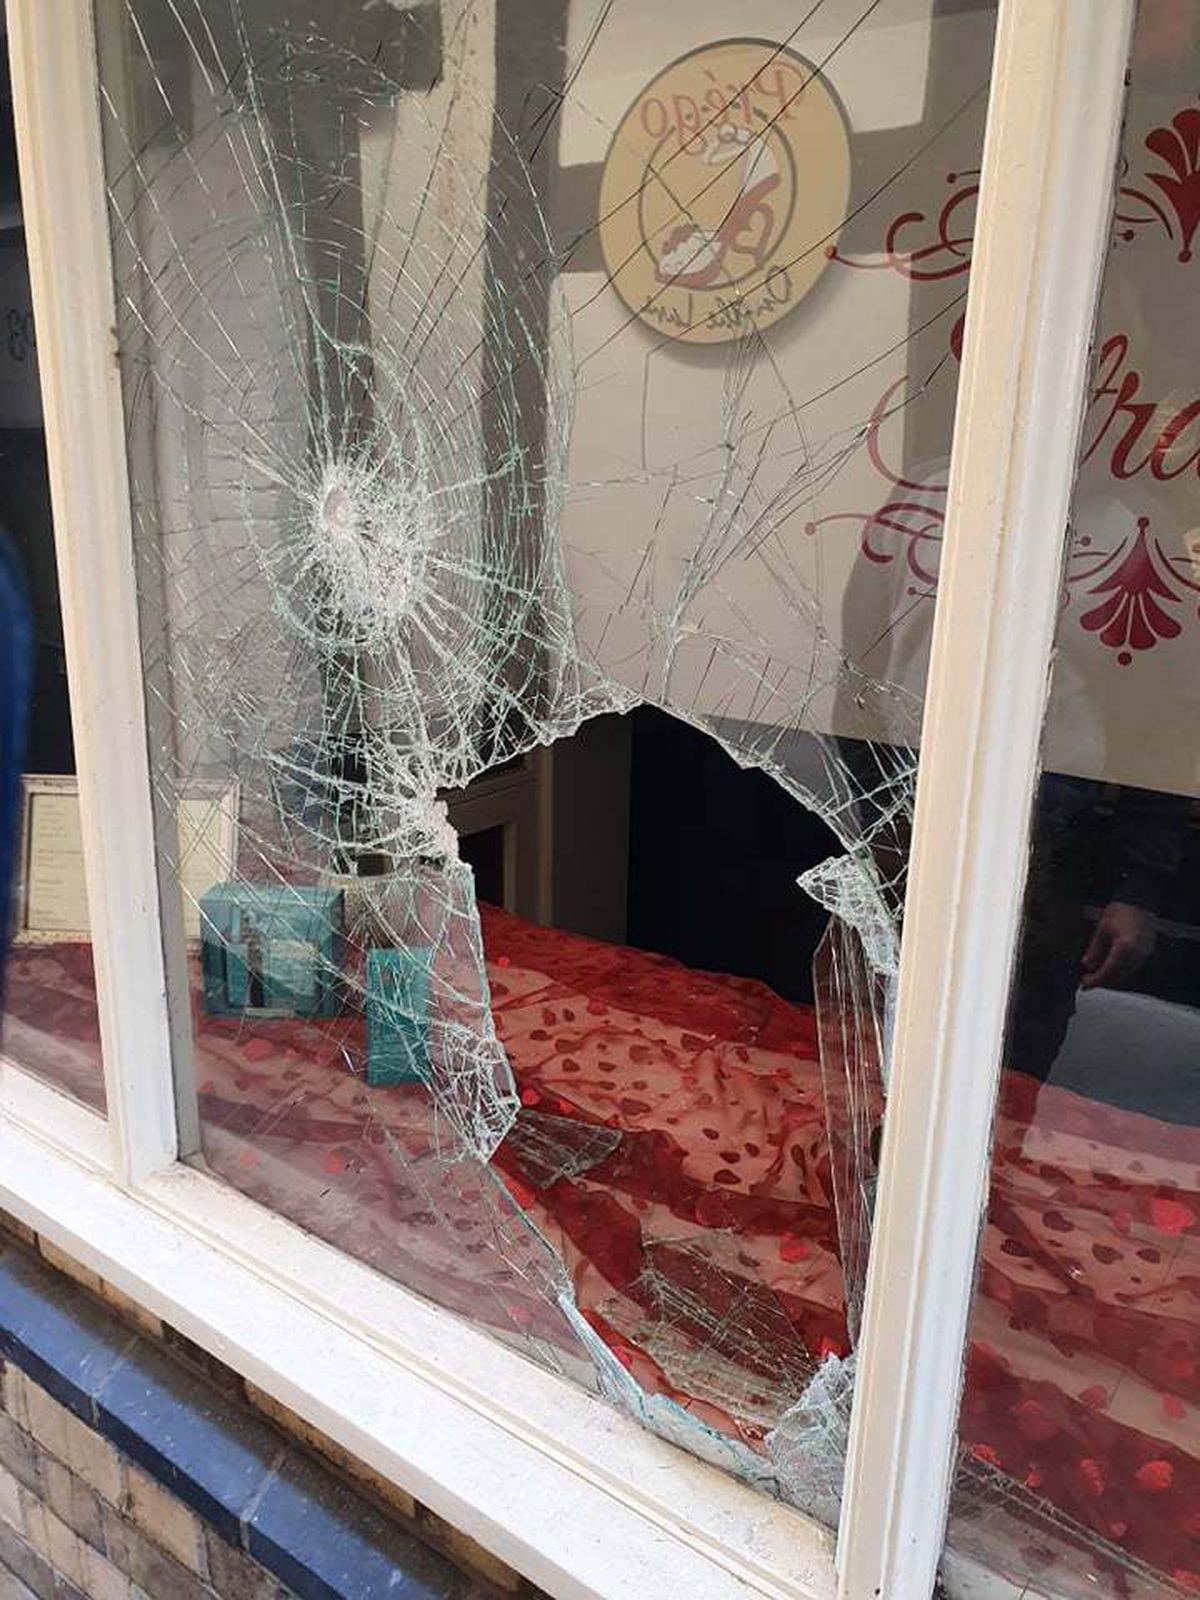 The smashed window at Strands in Grope Lane, Shrewsbury